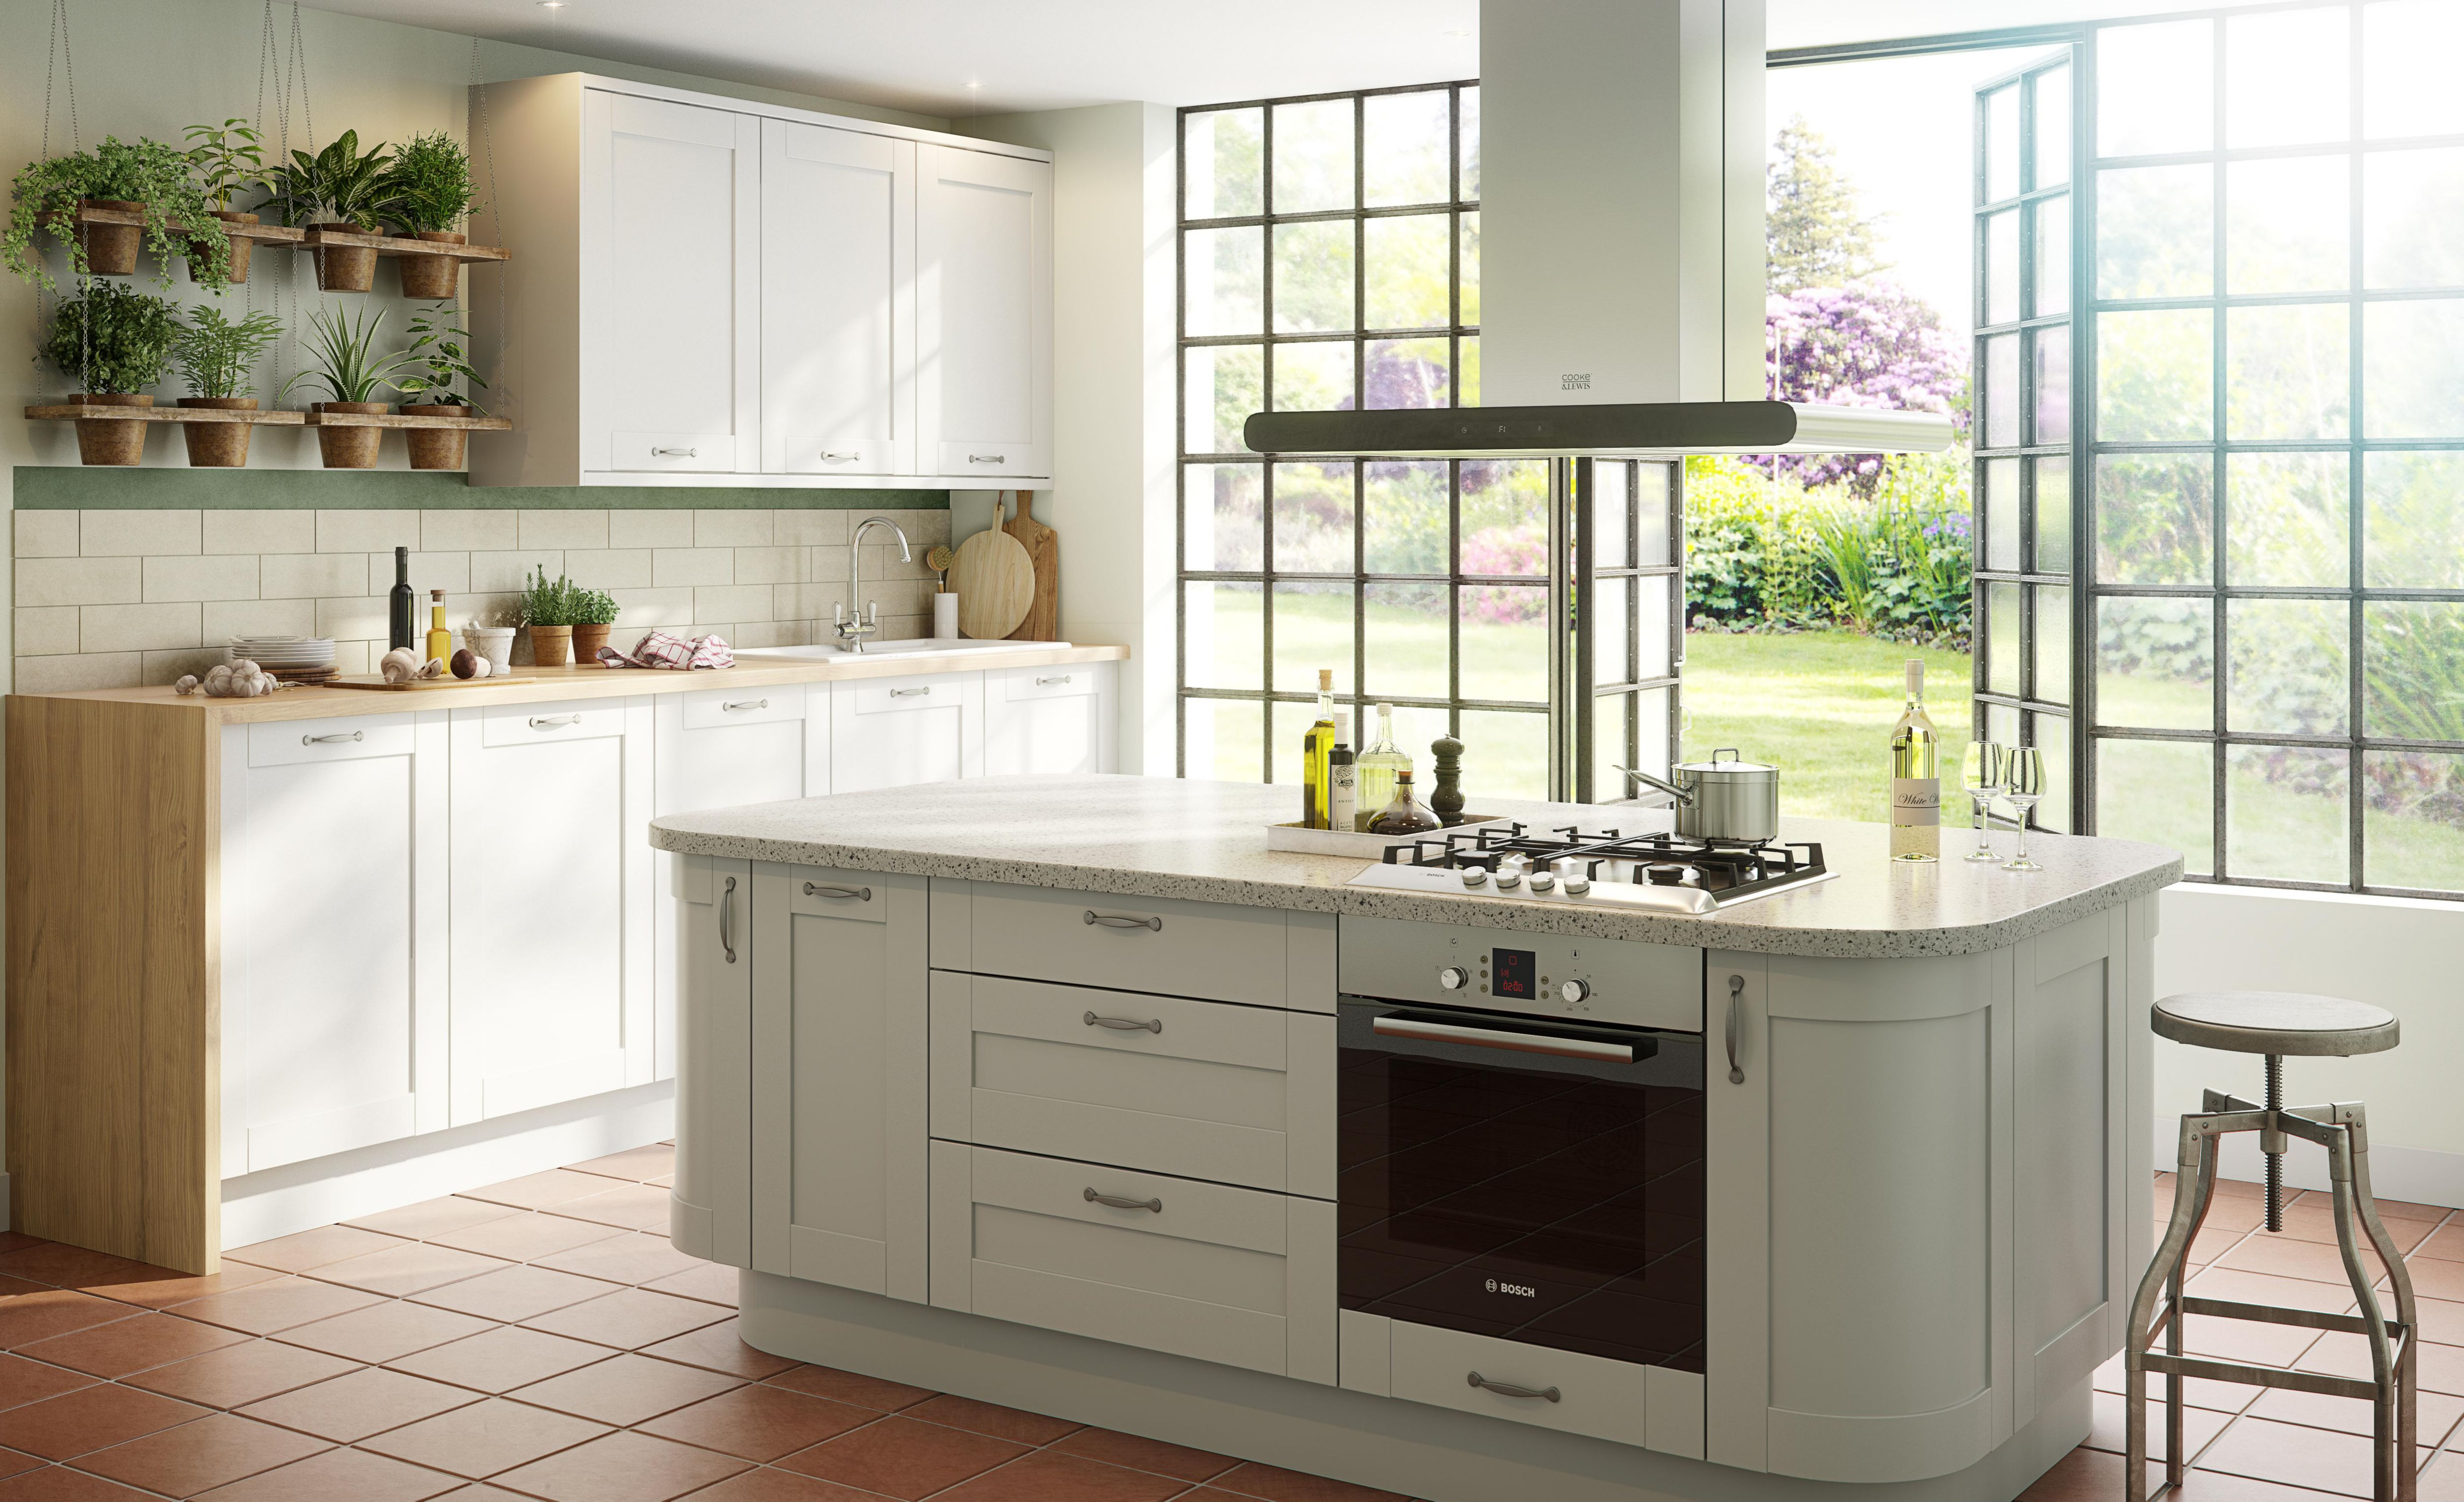 Scandinavian kitchen design ideas Help Ideas DIY at BQ